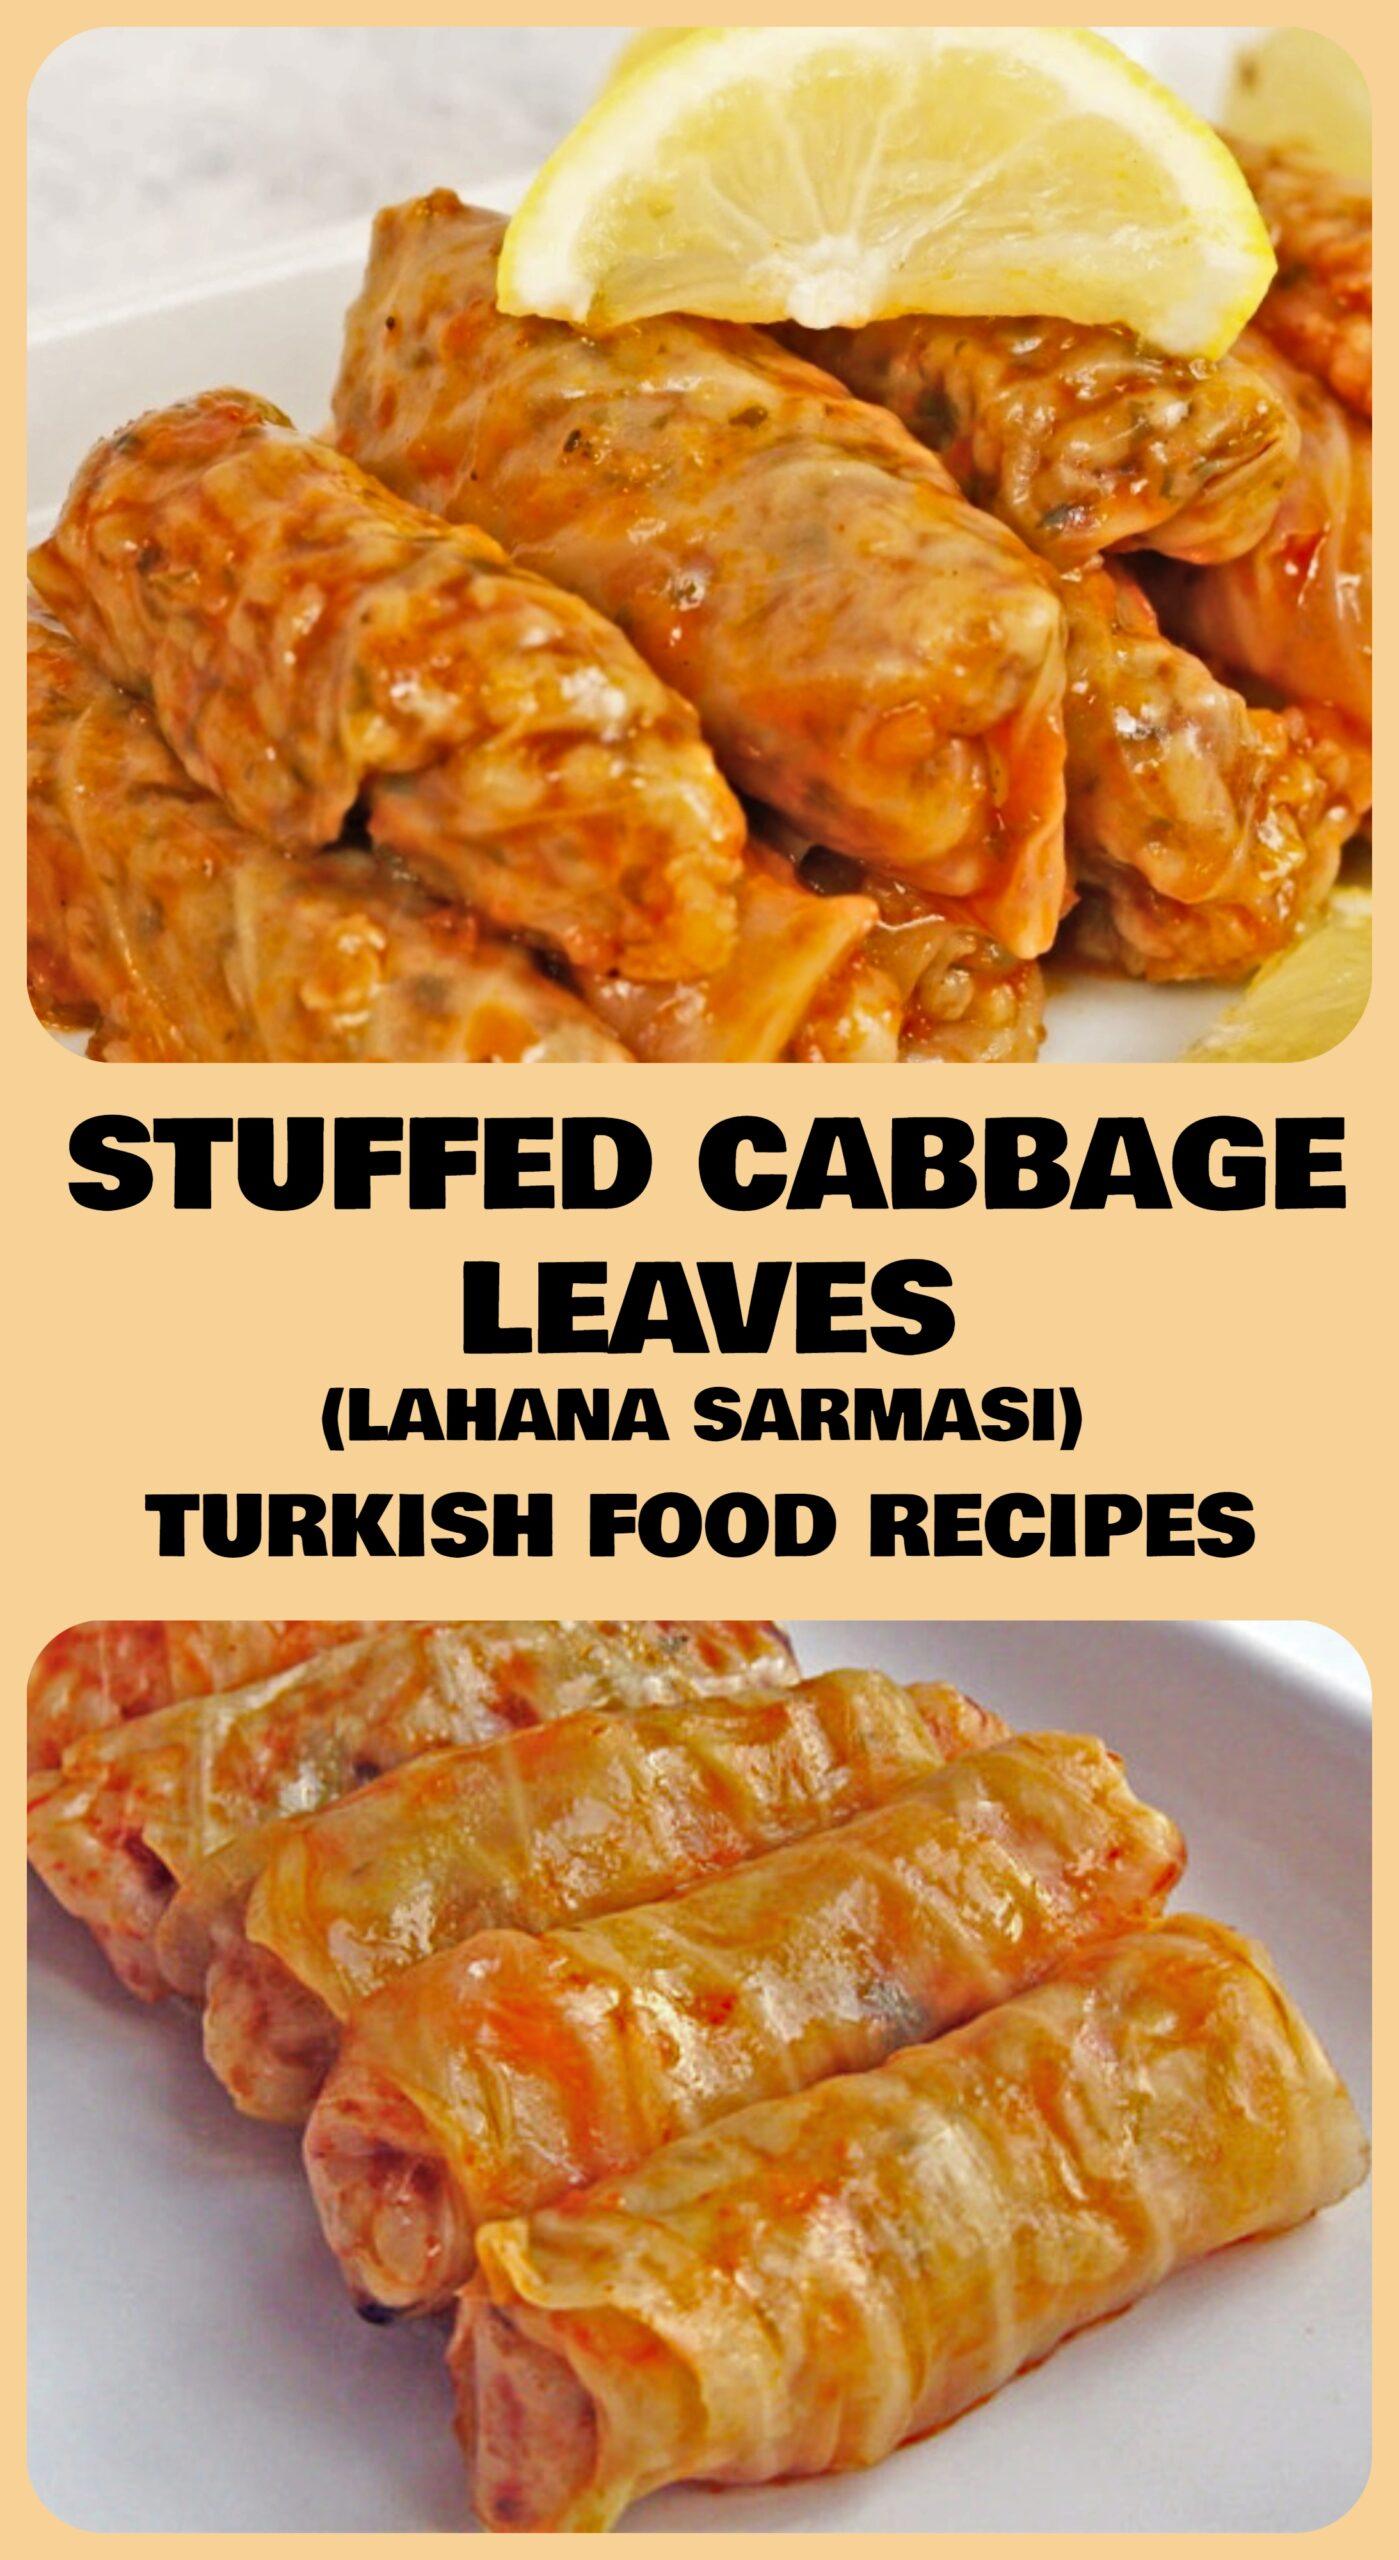 Stuffed Cabbage Leaves - Lahana Sarmasi Recipe